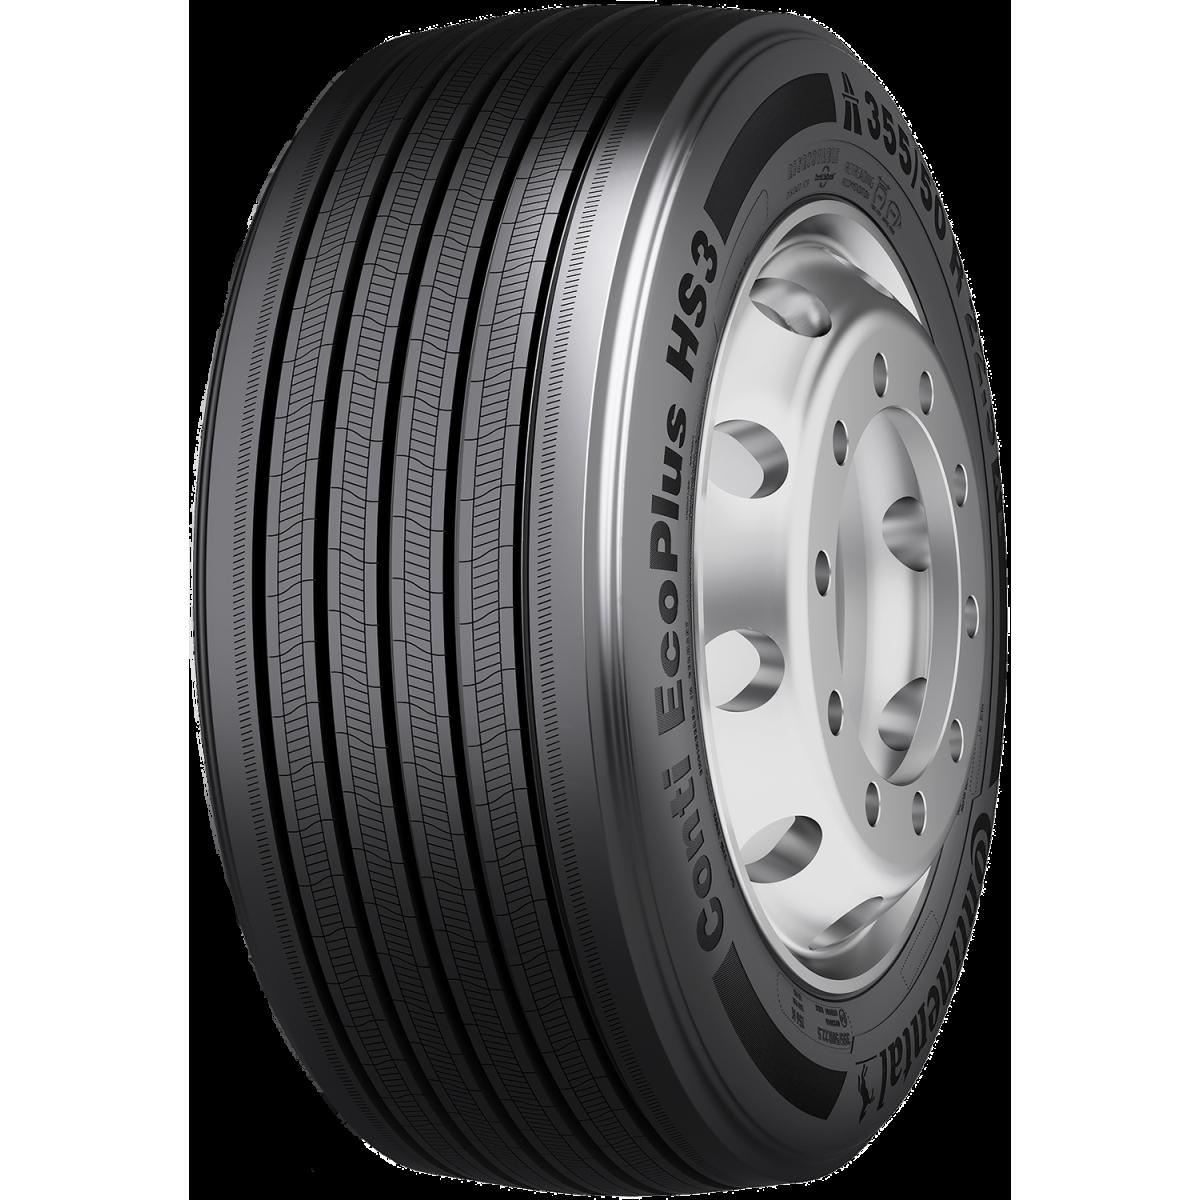 Грузовые шины Continental Conti Ecoplus HS3, 355/50R22.5